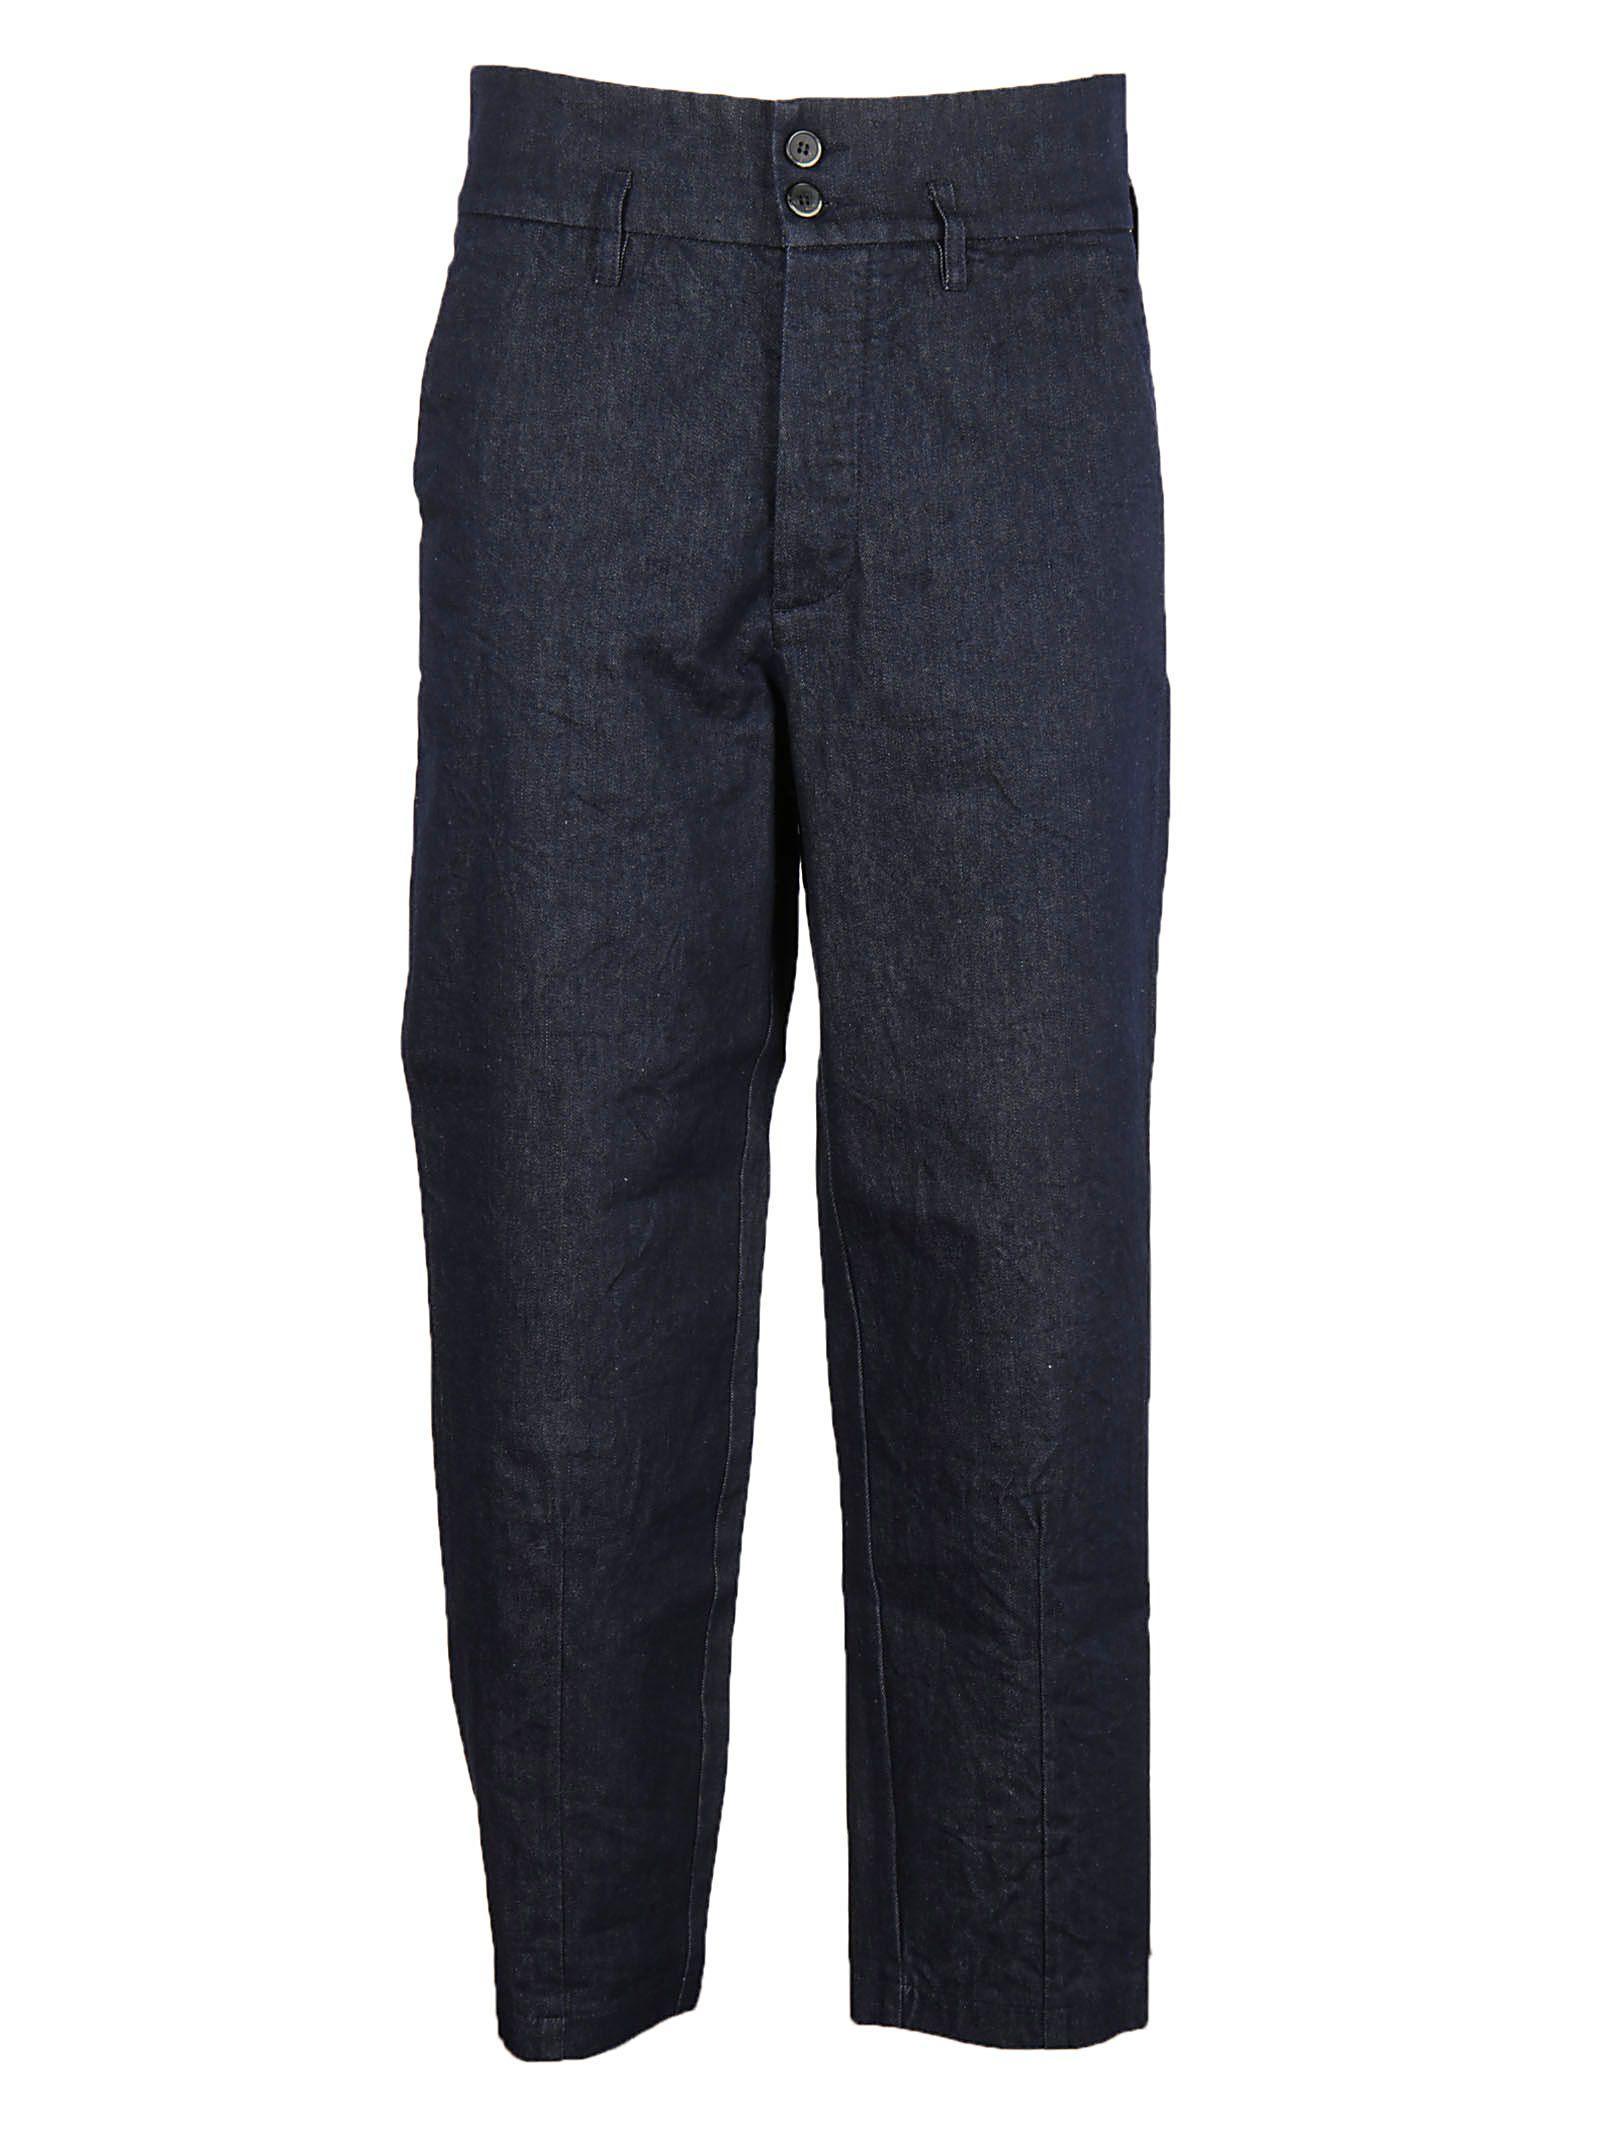 Barena Venezia Loose-fit Jeans In Blue